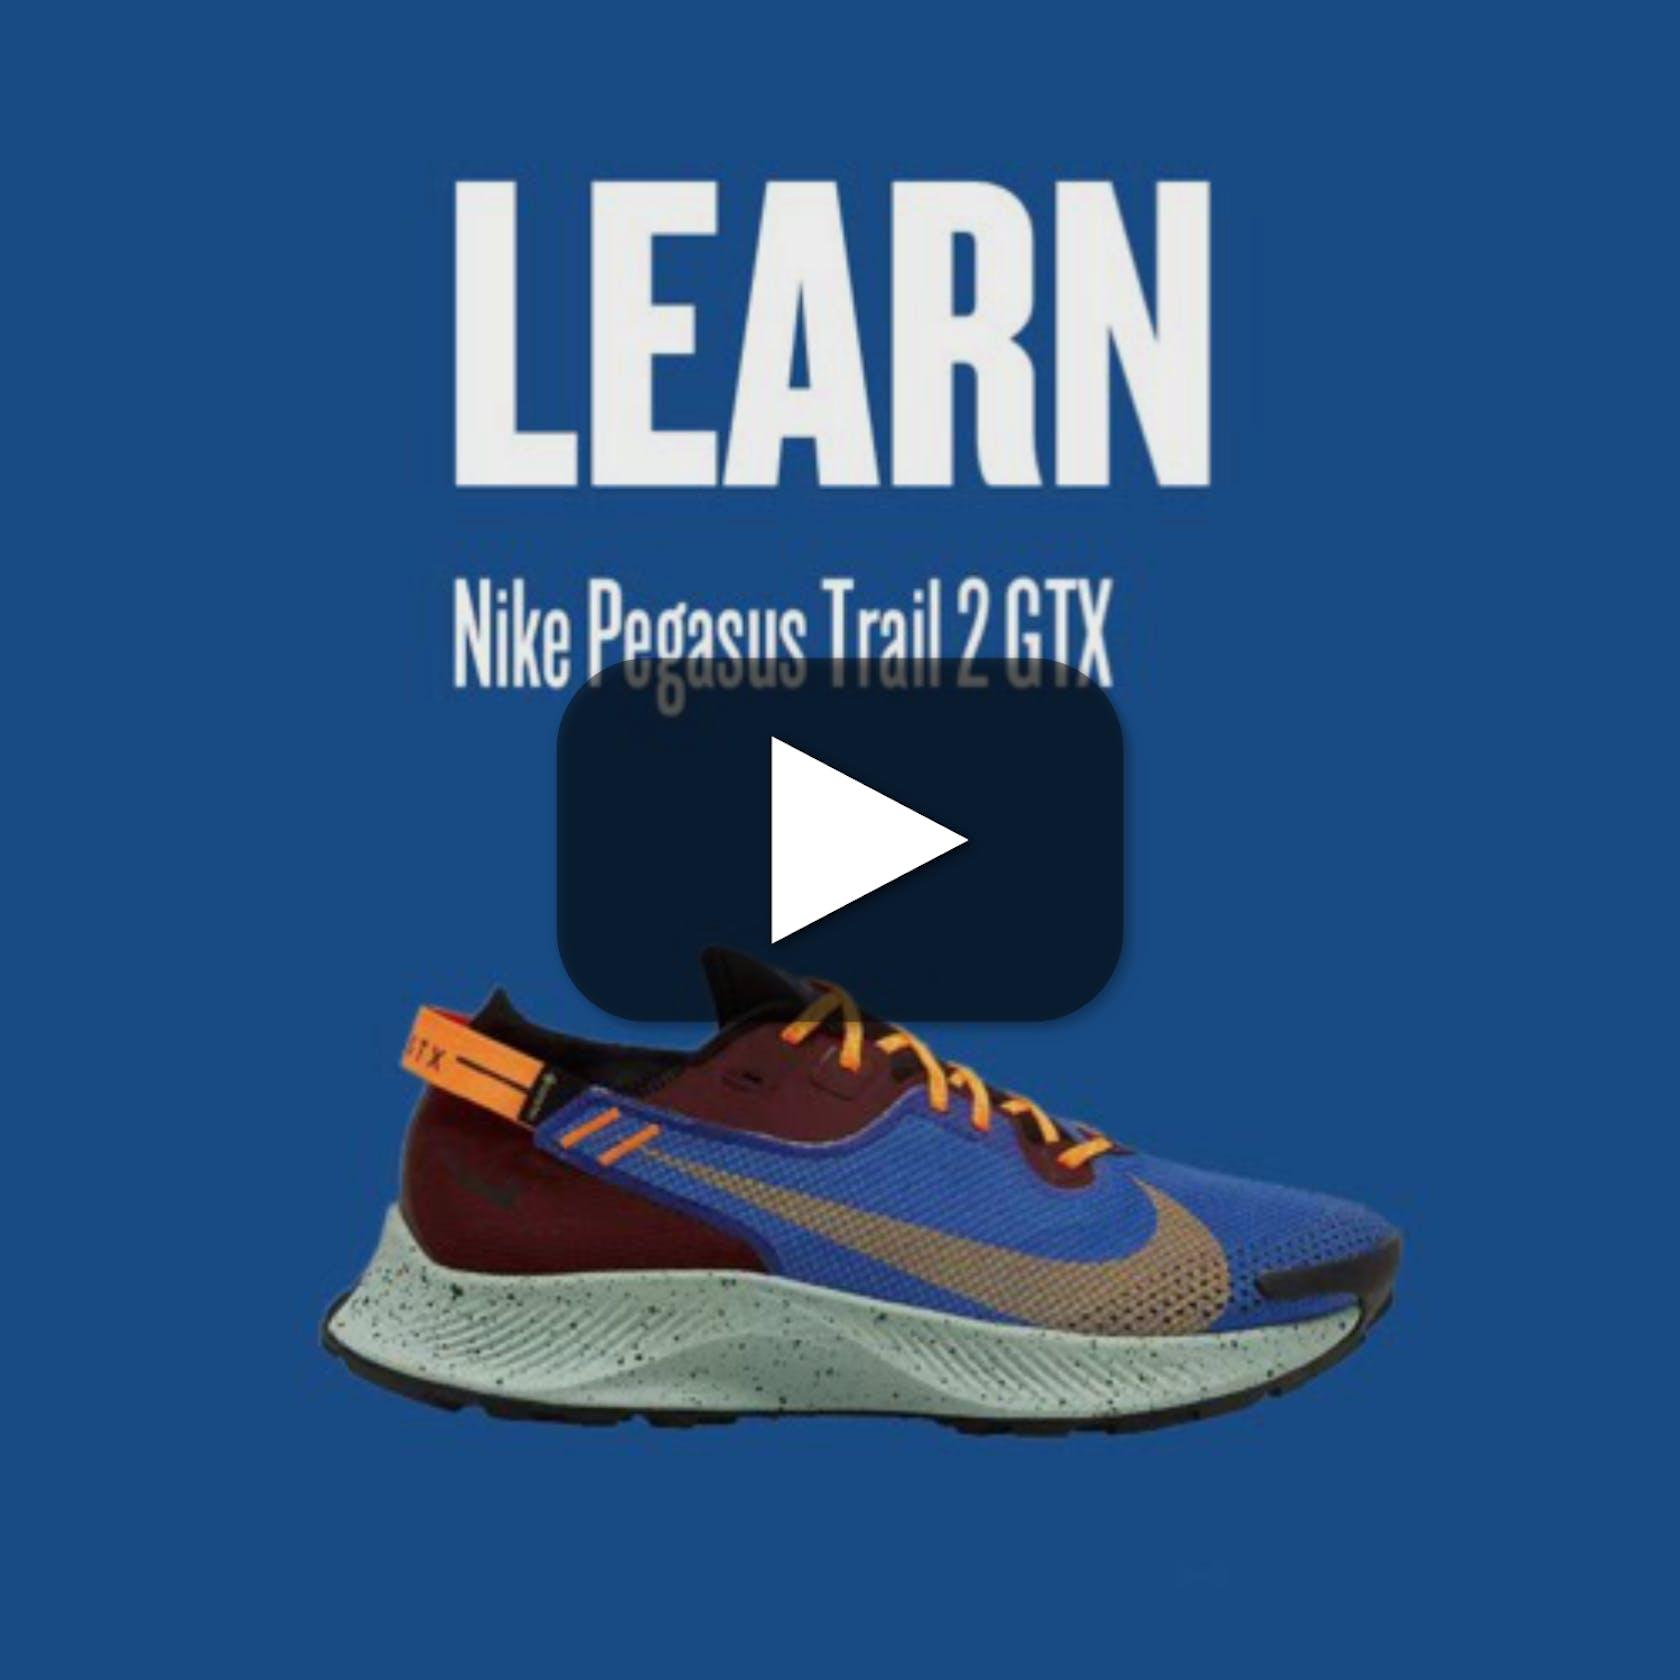 #LEARN Nike Pegasus Trail 2 GTX